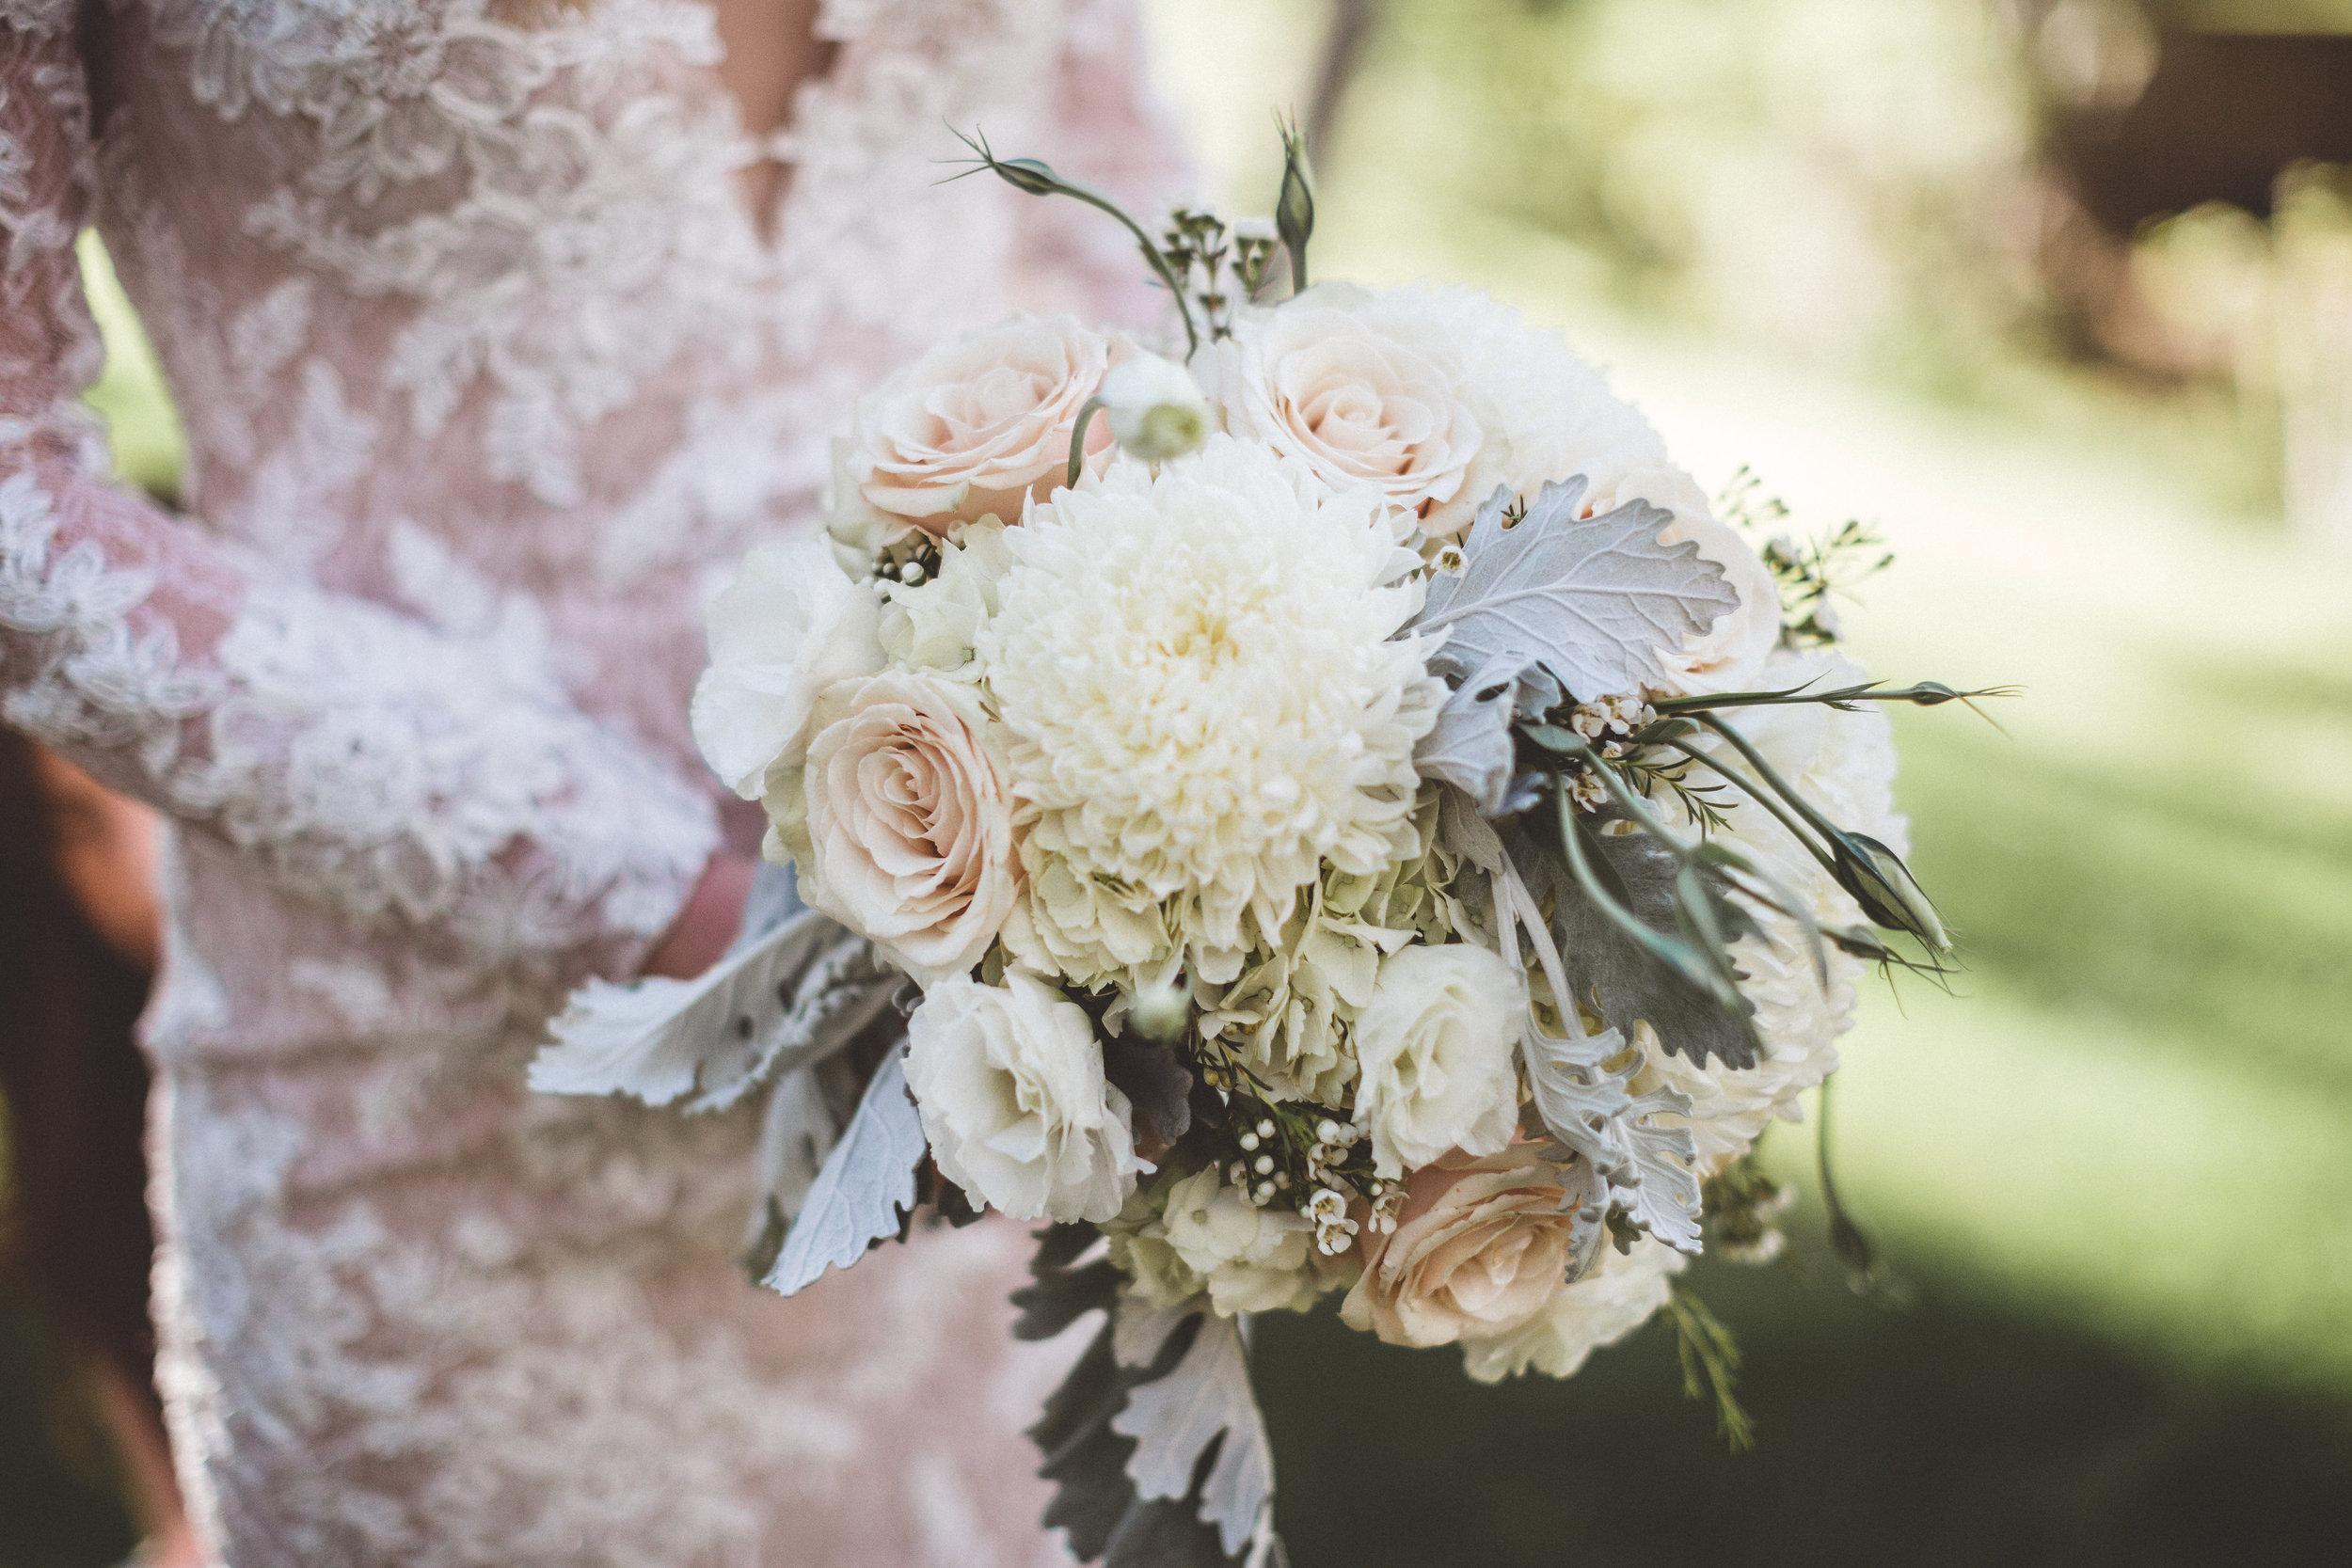 jill-and-alexs-intimates-big-bear-wedding36.jpg